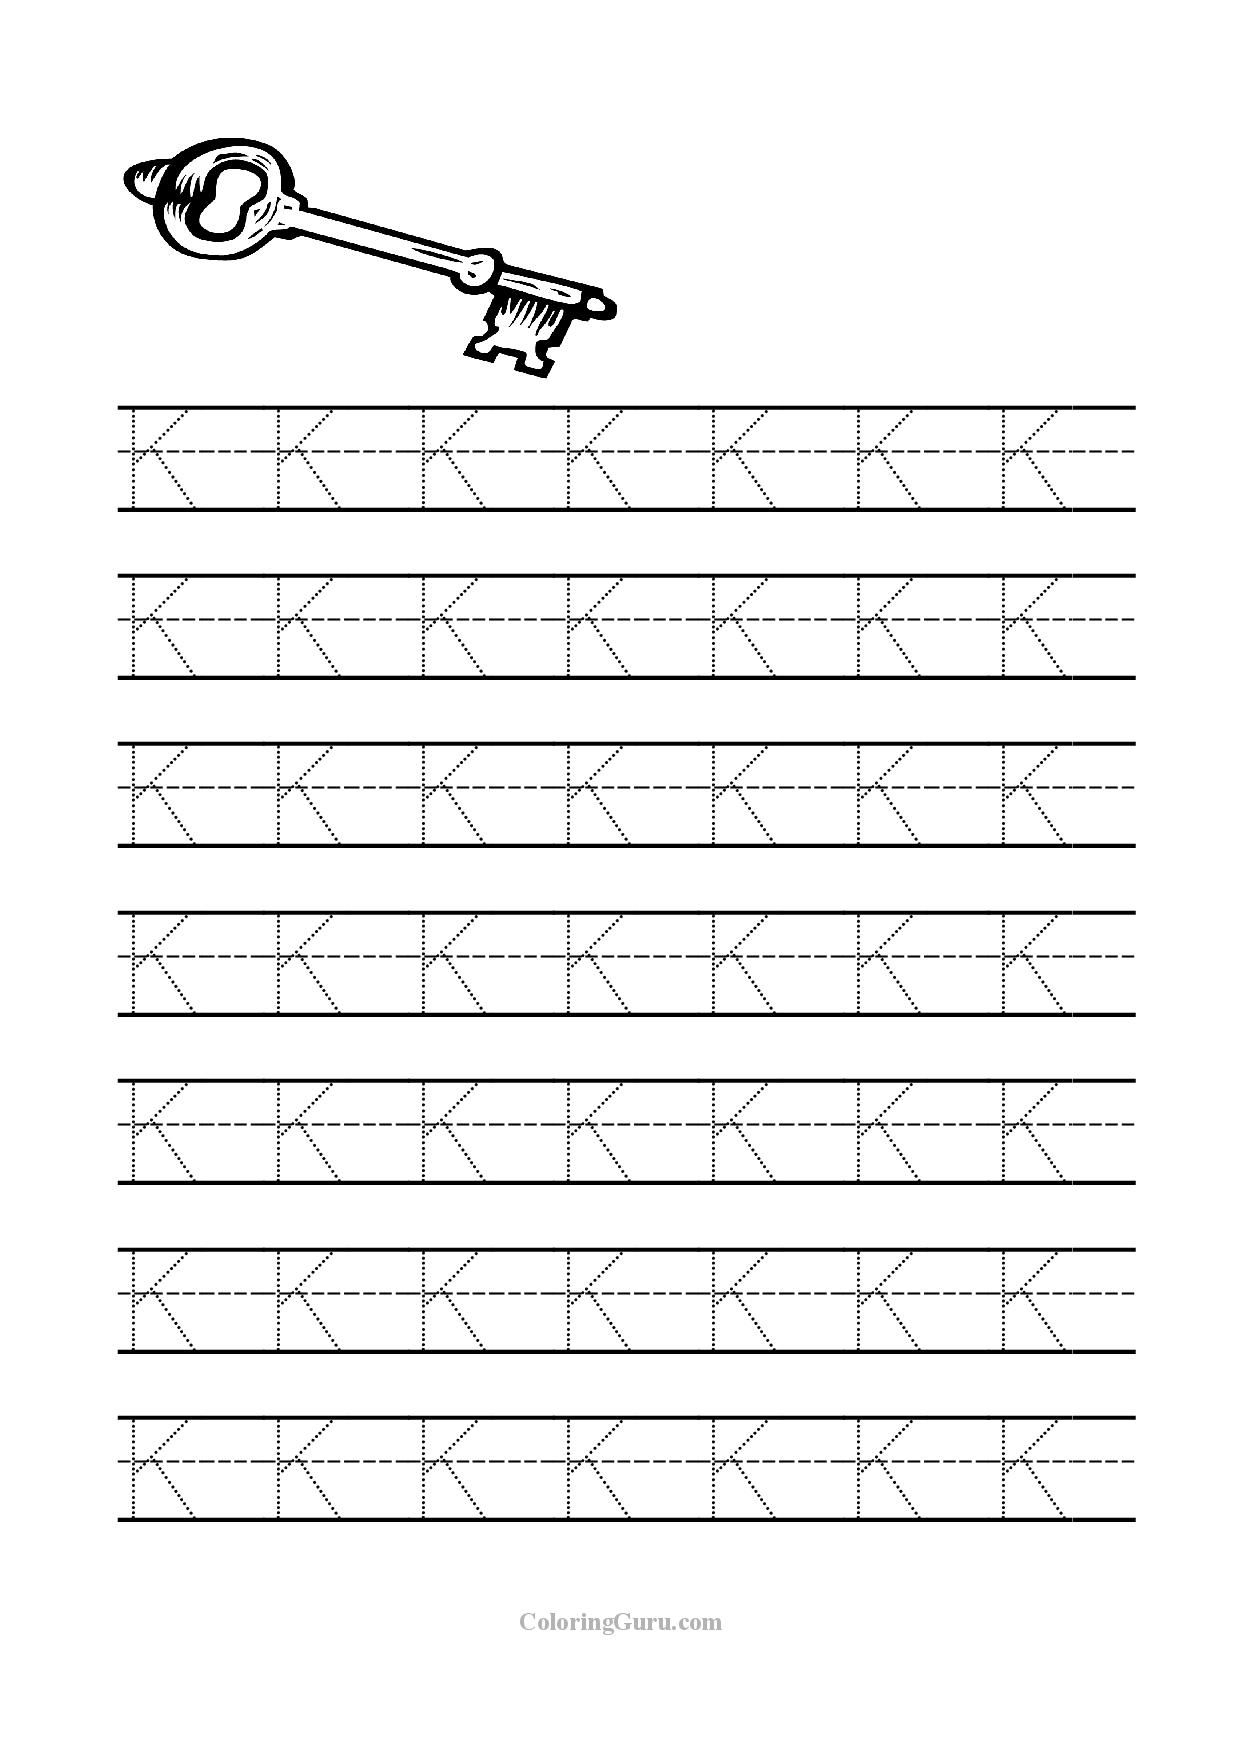 Free Printable Tracing Letter K Worksheets For Preschool | Kids | Free Printable Letter K Worksheets